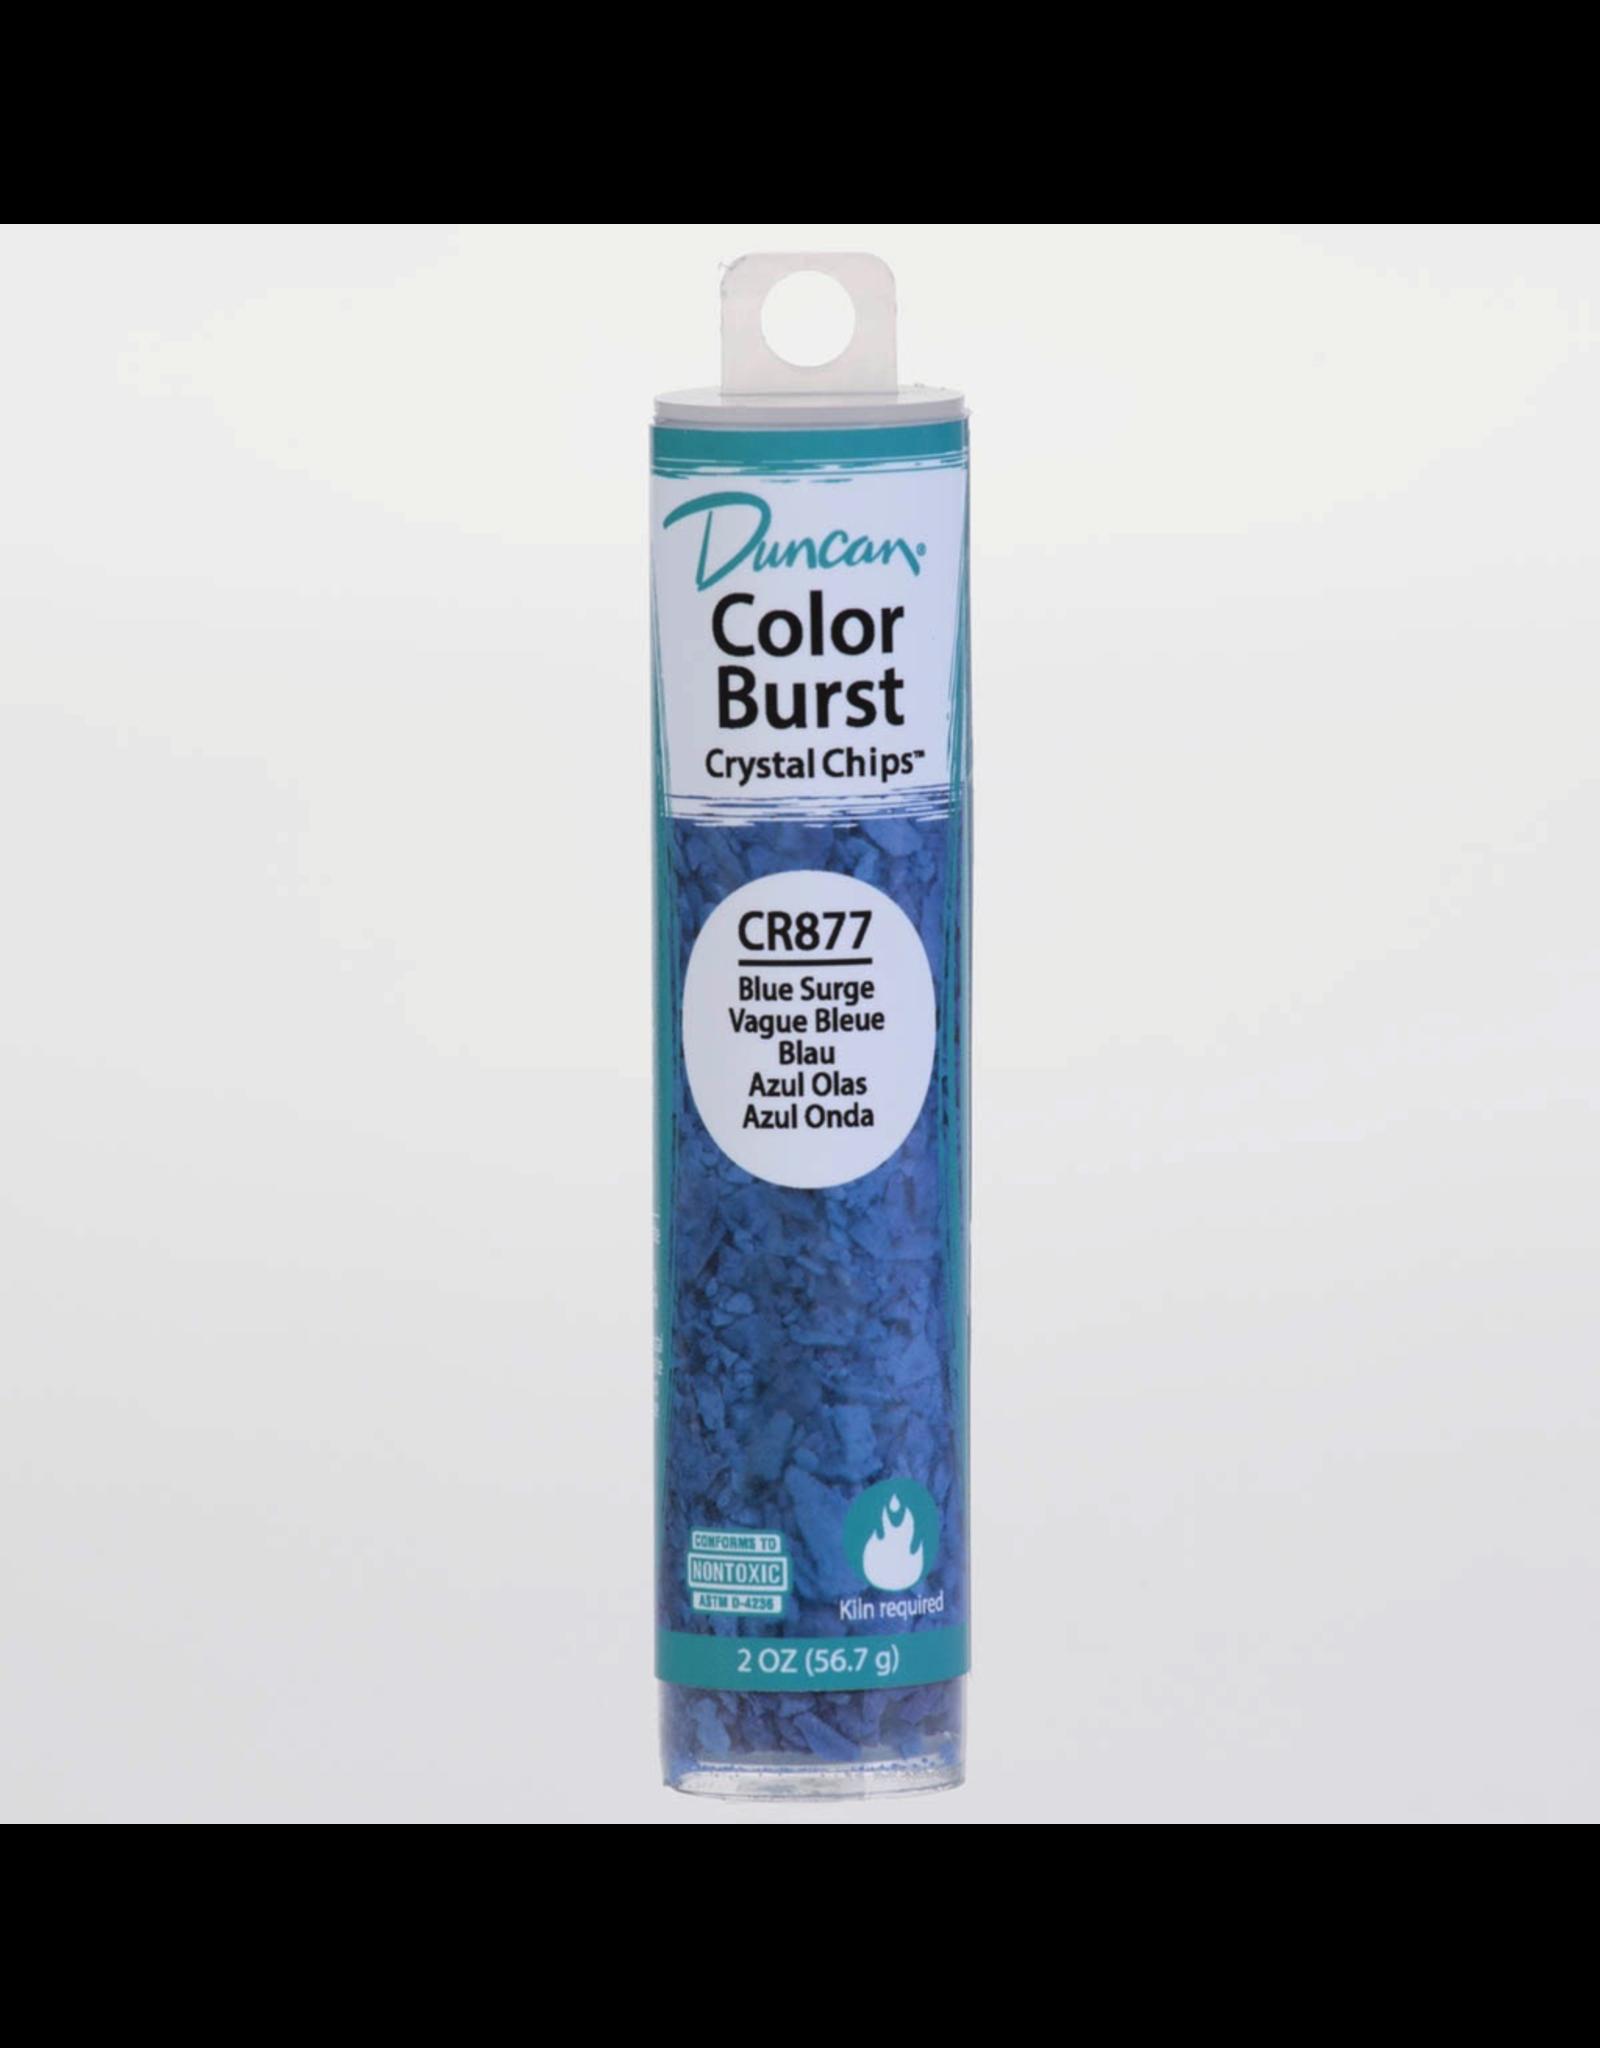 Duncan Blue Surge Colour Burst Crystal Chips